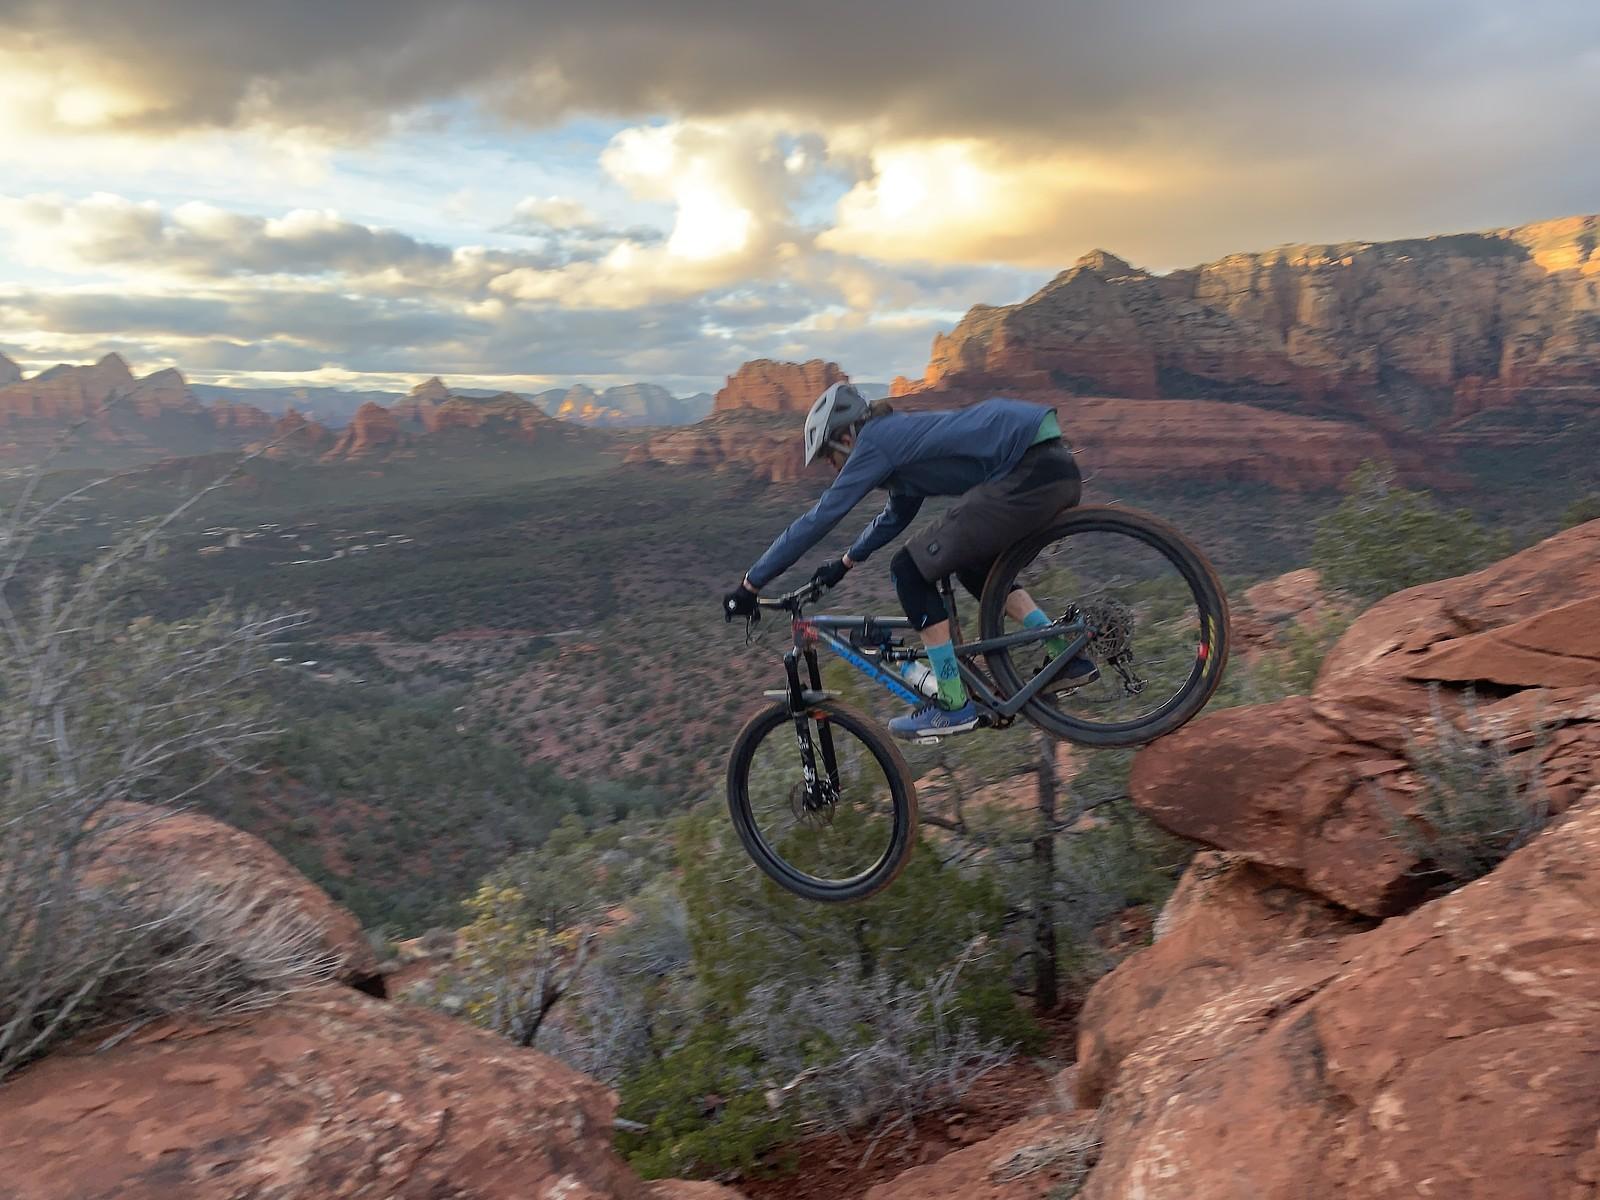 2019-01-16 17 13 33-1 - FlowyMcFlowerton - Mountain Biking Pictures - Vital MTB